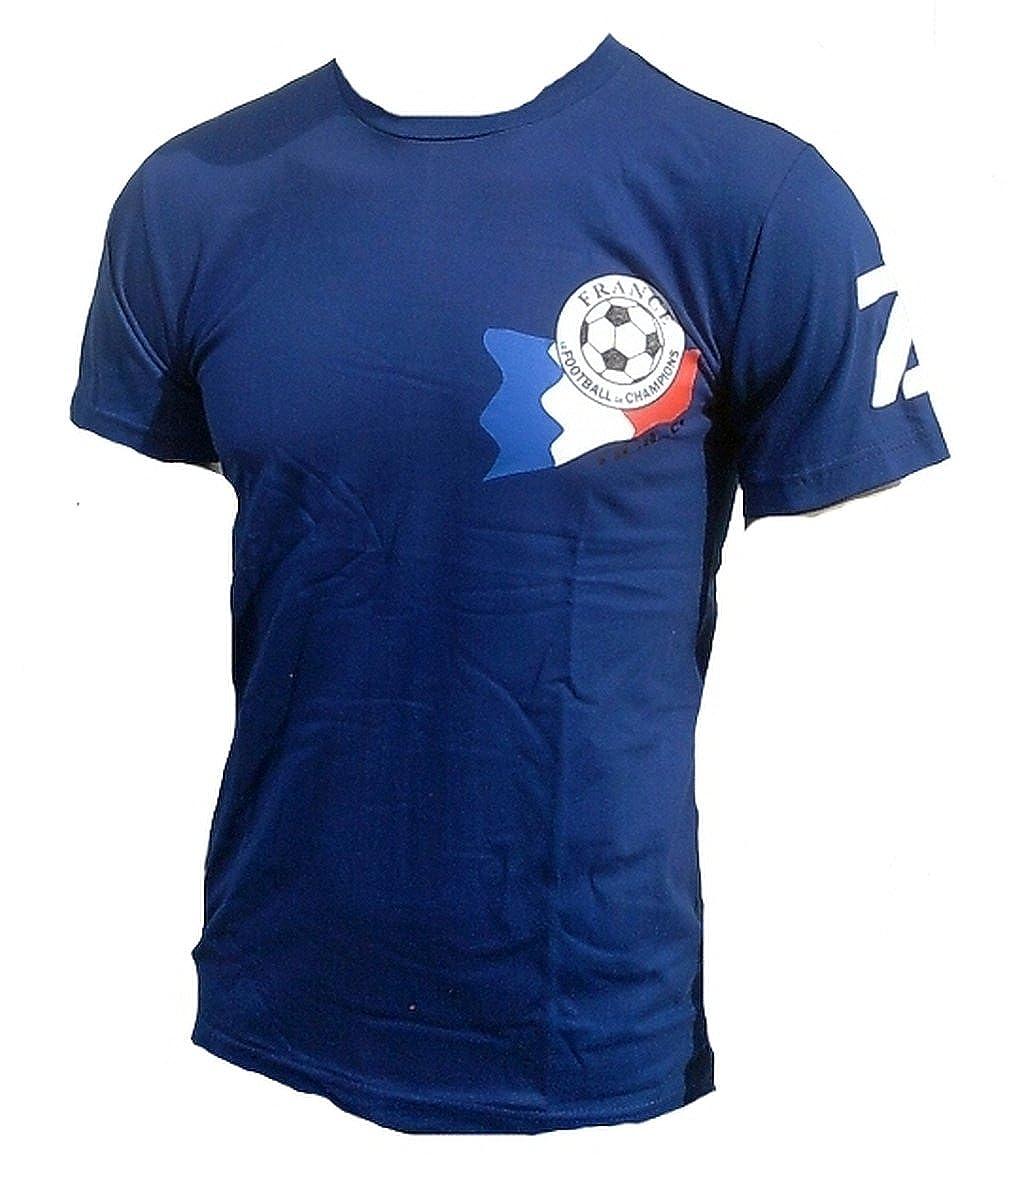 TICILA Camiseta para hombre Maitre Football Equipe Tricolore Francia France Fútbol WM EM Designer Fan Tee Camiseta Azul: Amazon.es: Ropa y accesorios